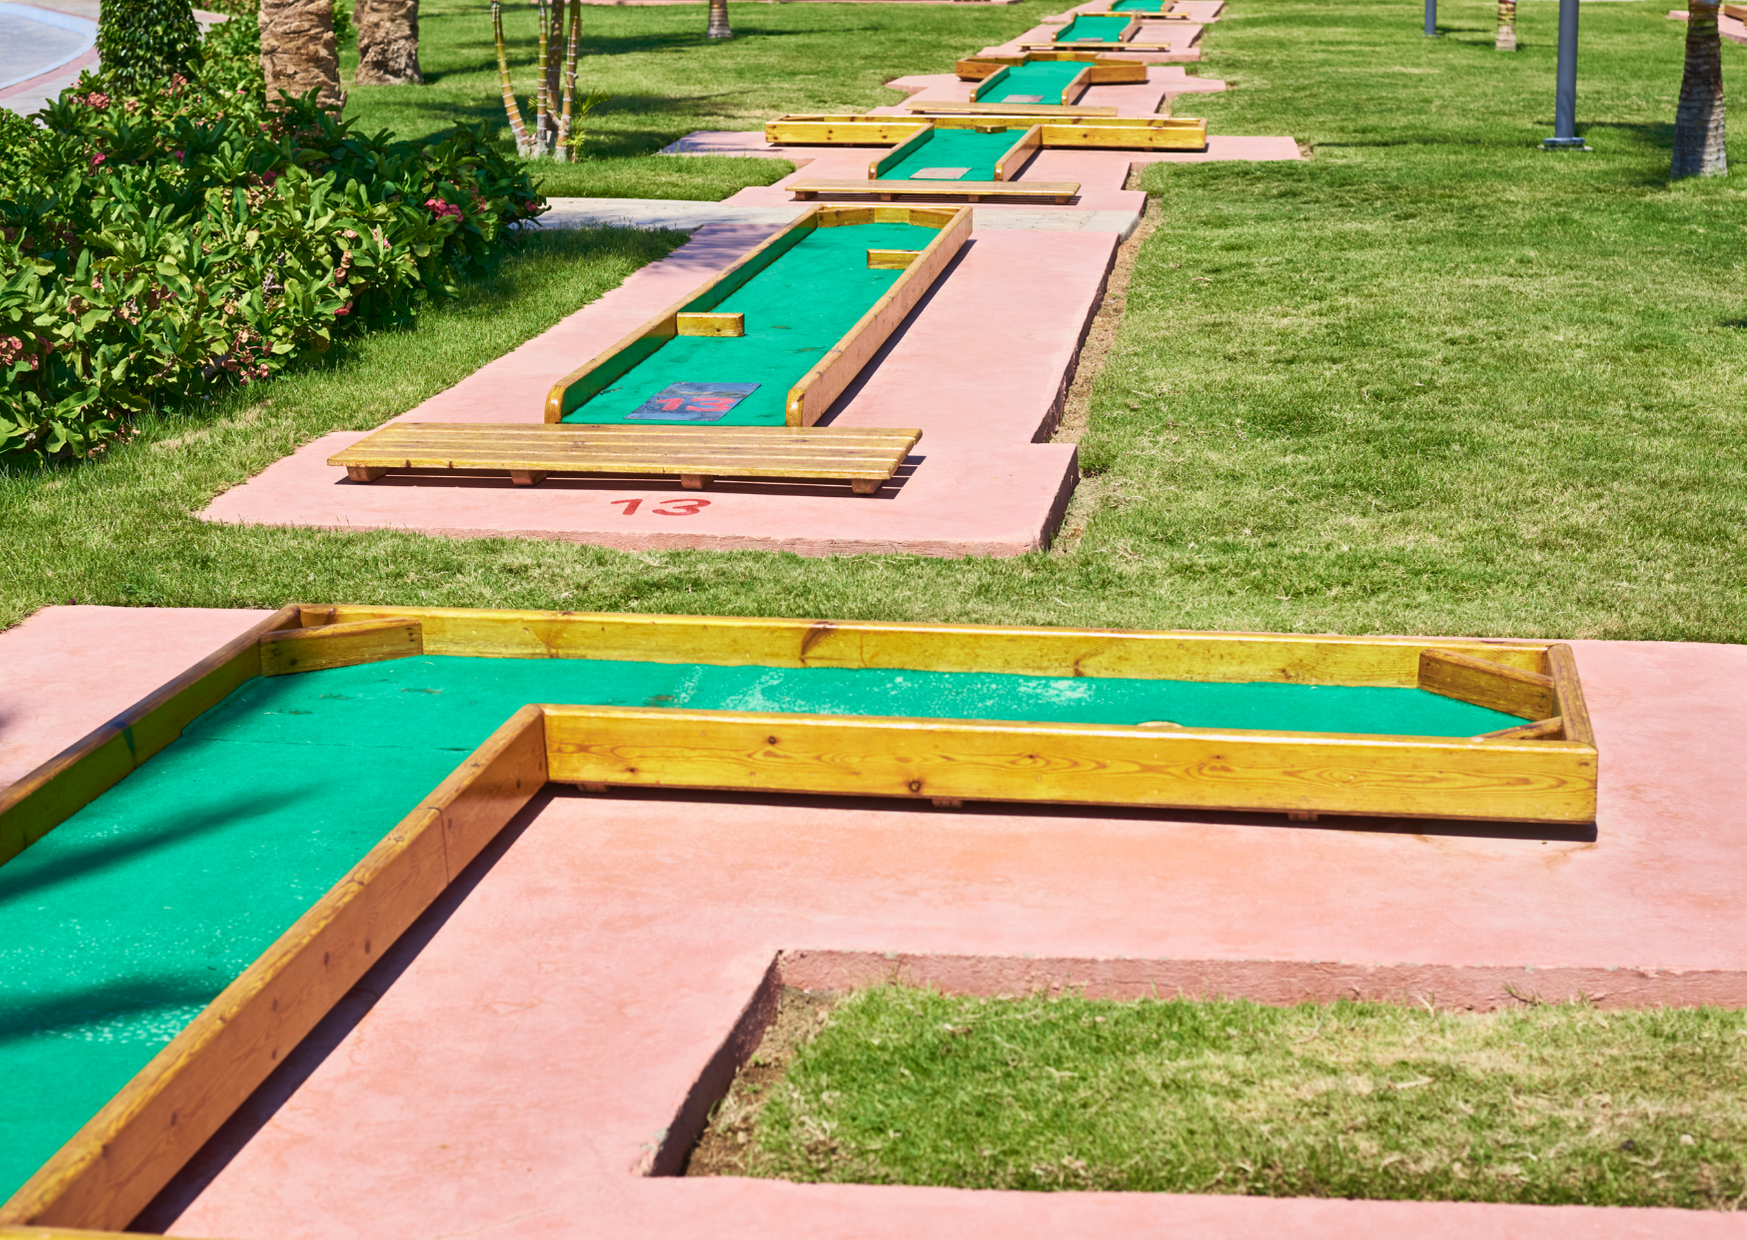 lawn game